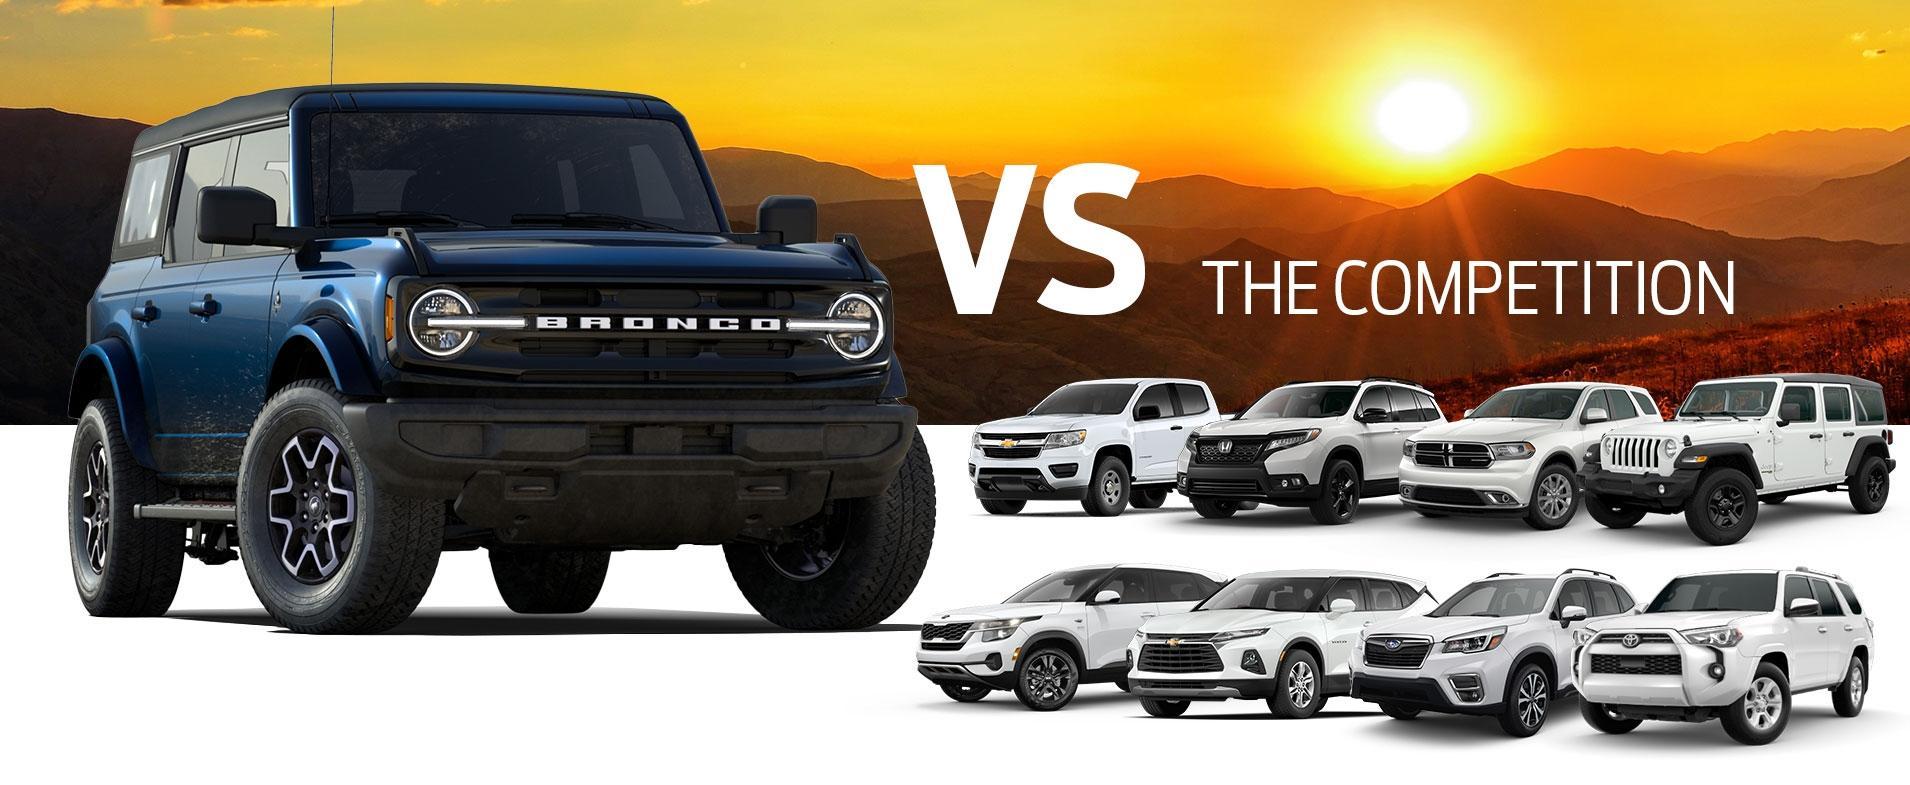 Bronco Sport vs Competition